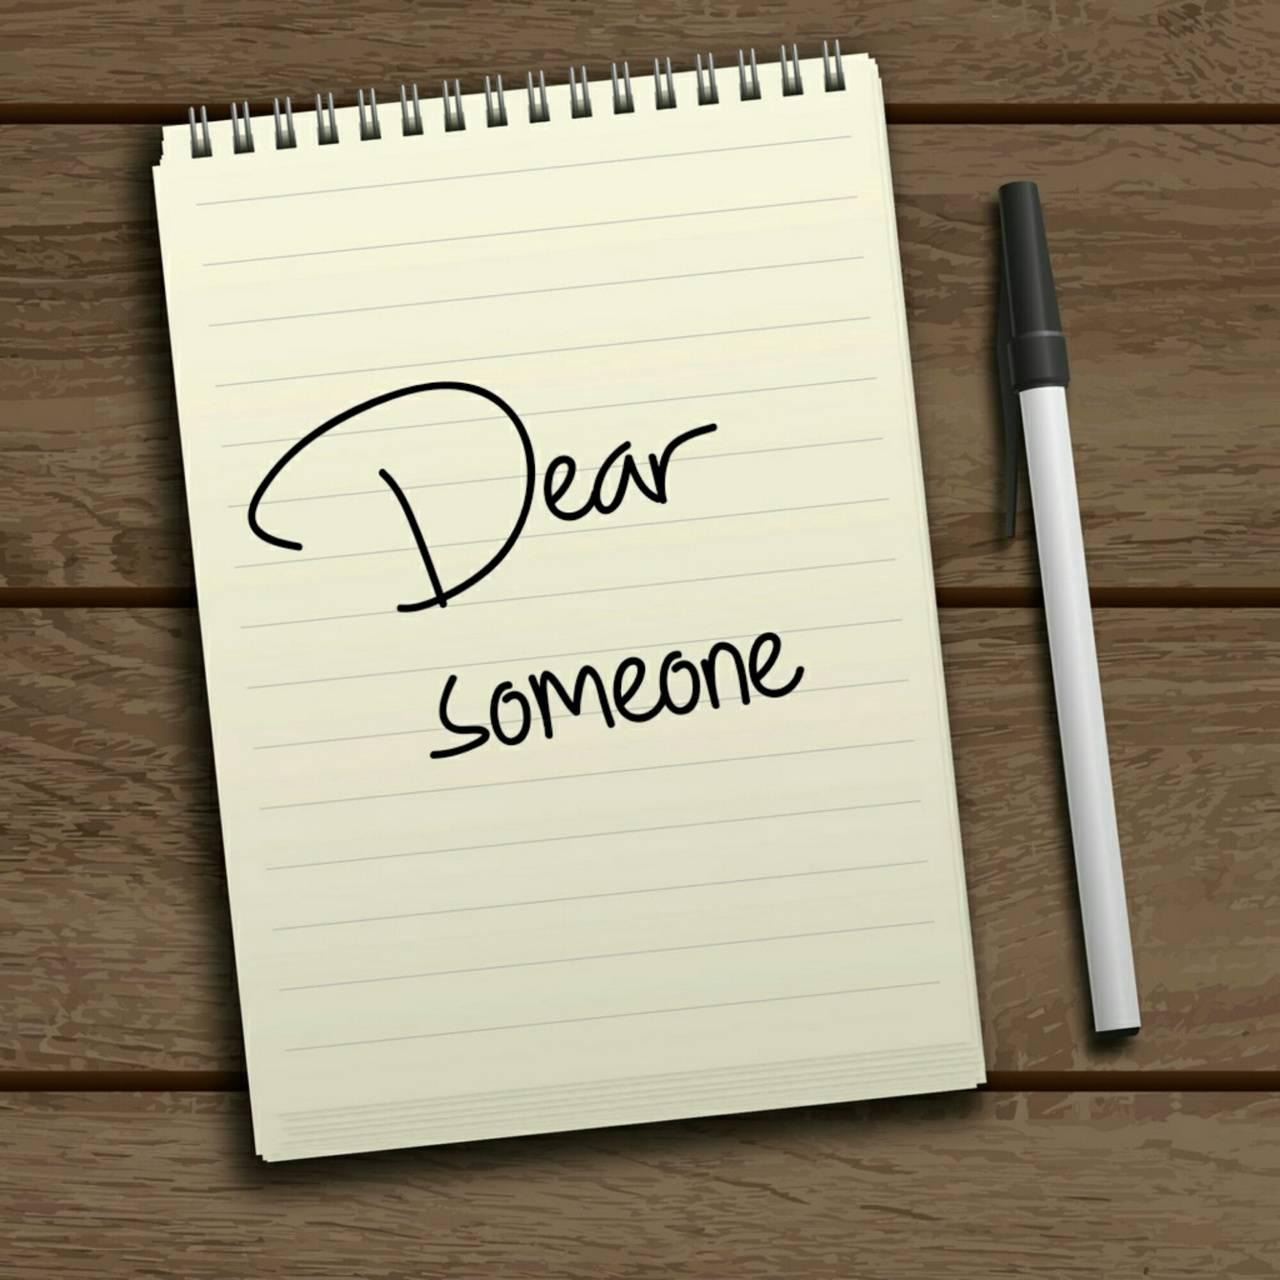 Dear someone